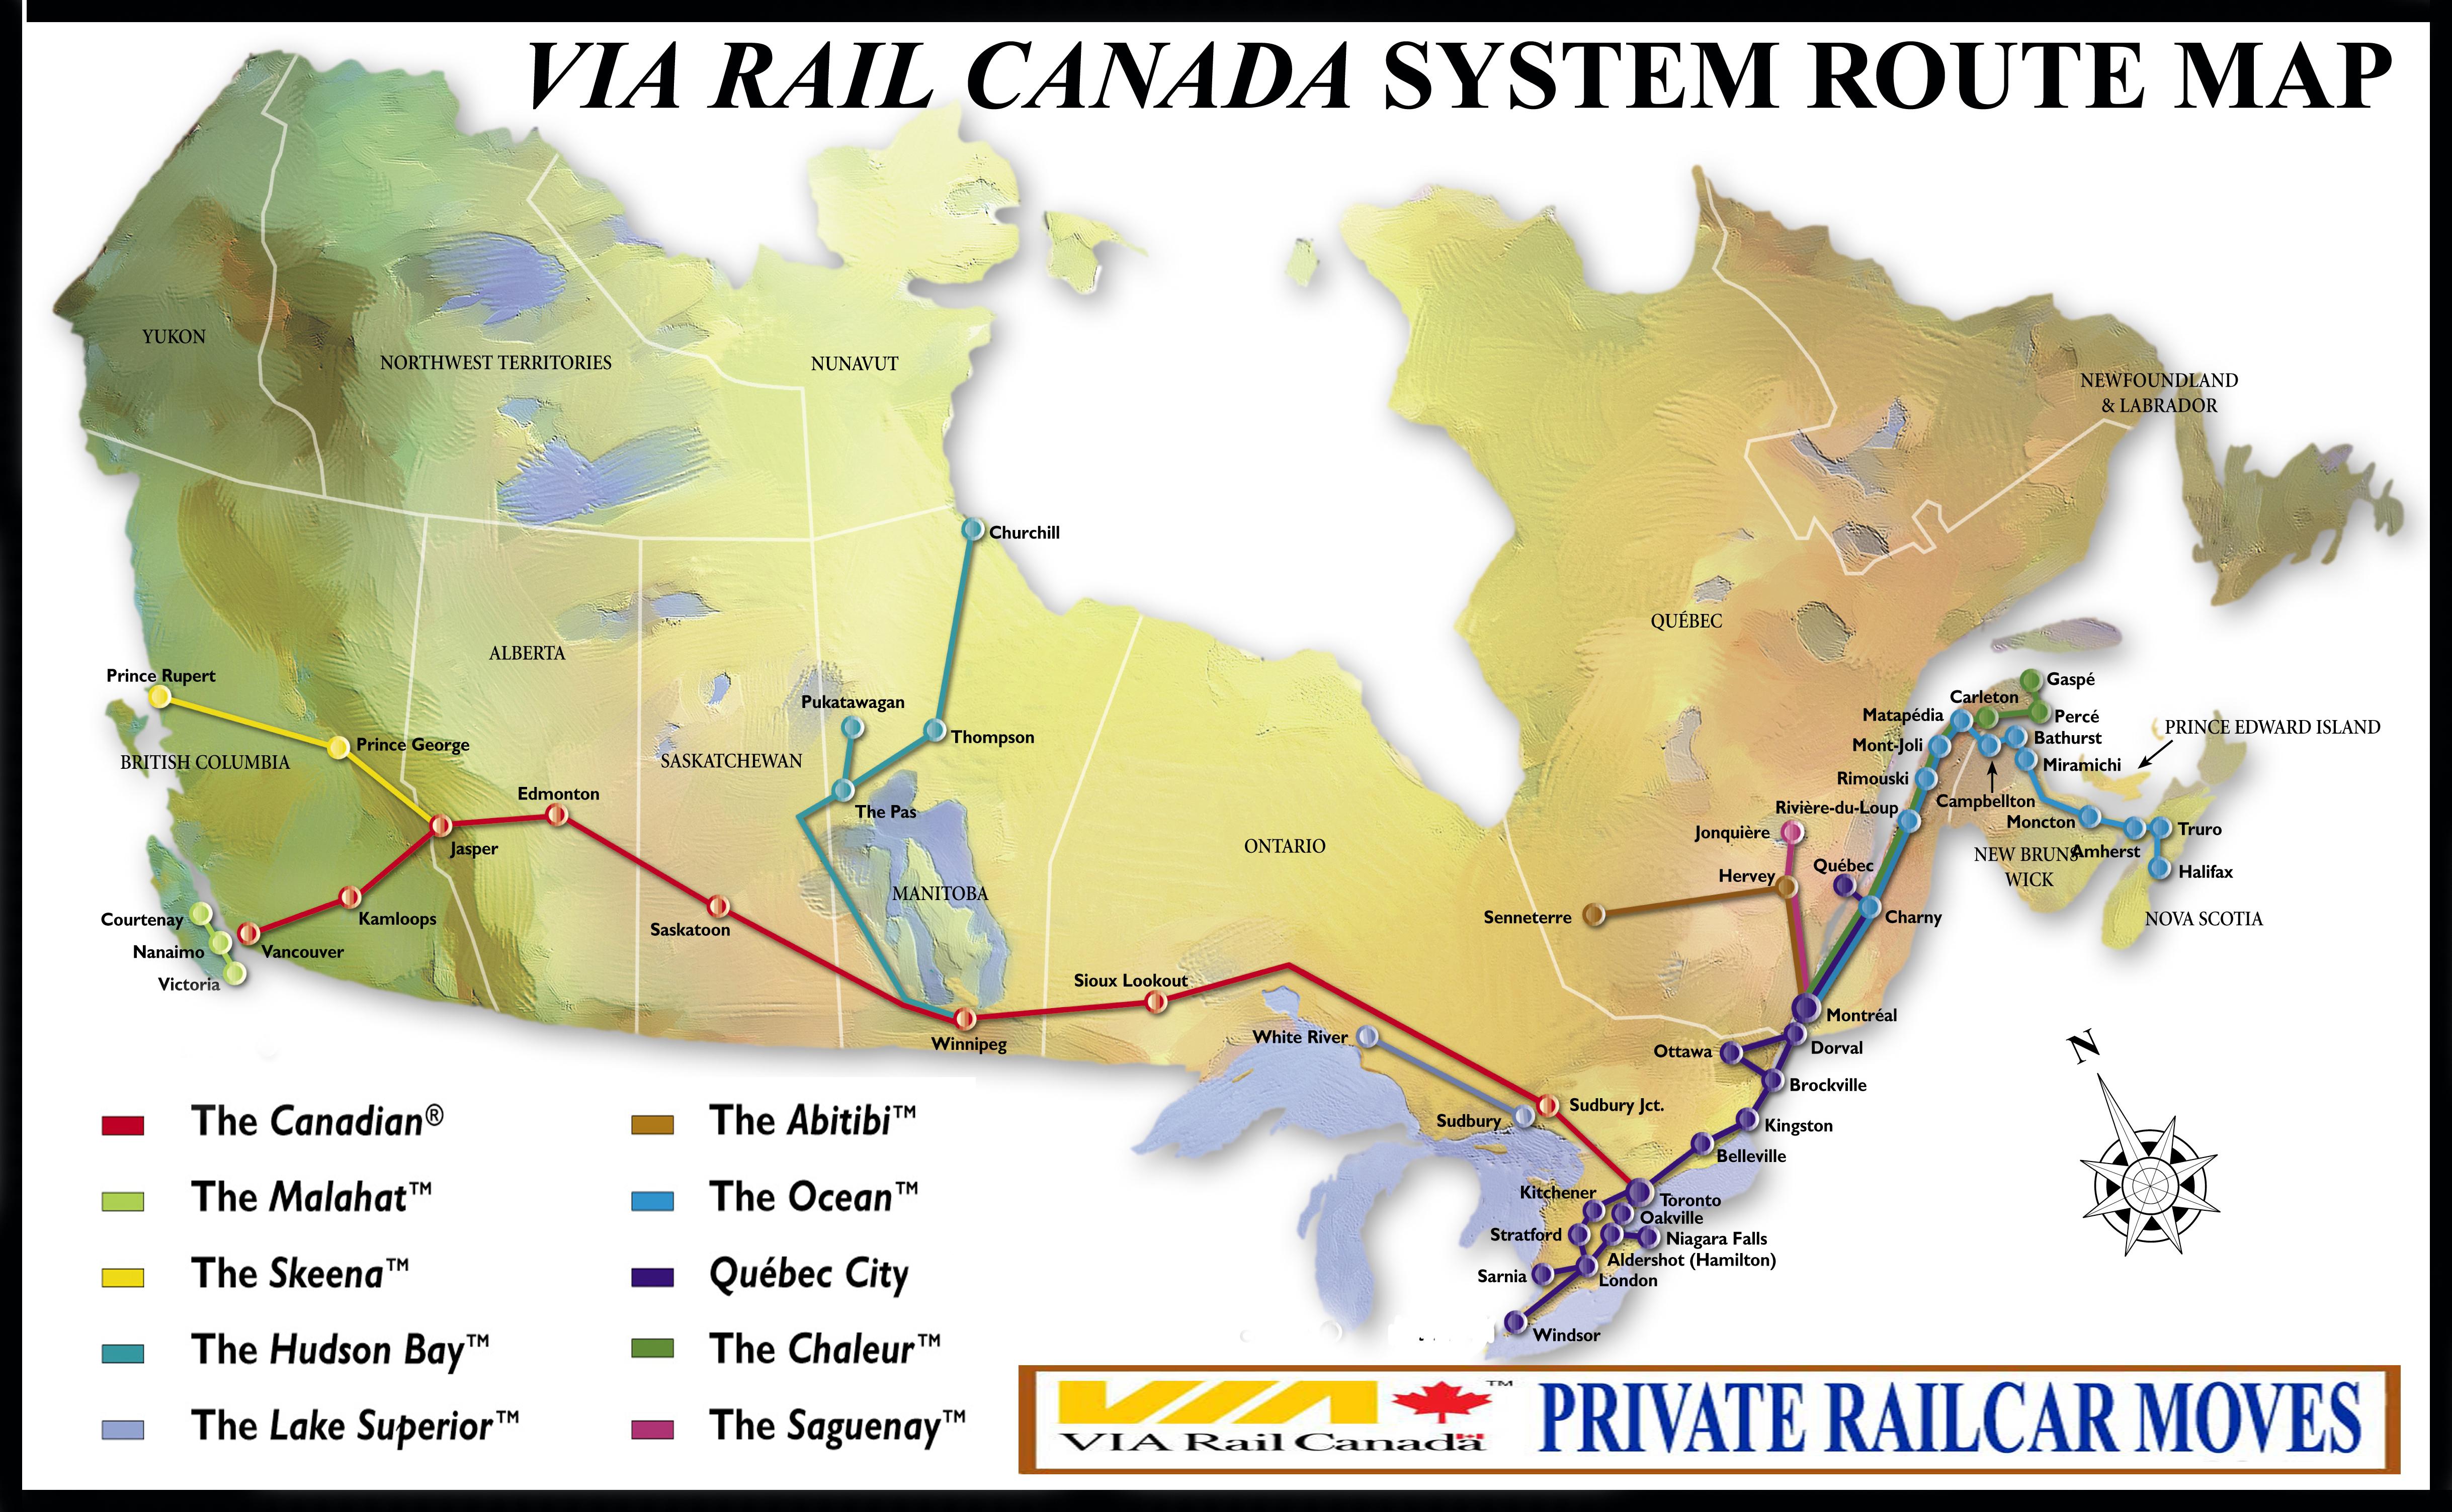 ATDLINES/RAILWAY BUSINESS CAR SERVICES-RAILWAY CITY/VIA RAIL ... on new jersey transit map, csx transportation, gare centrale, metra train chicago map, montana rail link map, rail network map, class i railroad, ontario northland railway, canadian national railway company, british airways map, canadian pacific map, newfoundland railway map, canadian pacific railway limited, norfolk southern railway, canadian rail system map, kansas city southern railway, cn rail map, central of georgia map, union station, soo line railroad, amtrak map, metrolink map, canadian national map, hudson bay railway, go transit, tshiuetin rail transportation, go train map, septa map, utah transit authority, union pacific railroad, seaboard coast line map, burlington northern map, bc rail map, penn central map, norfolk southern map, rocky mountaineer,